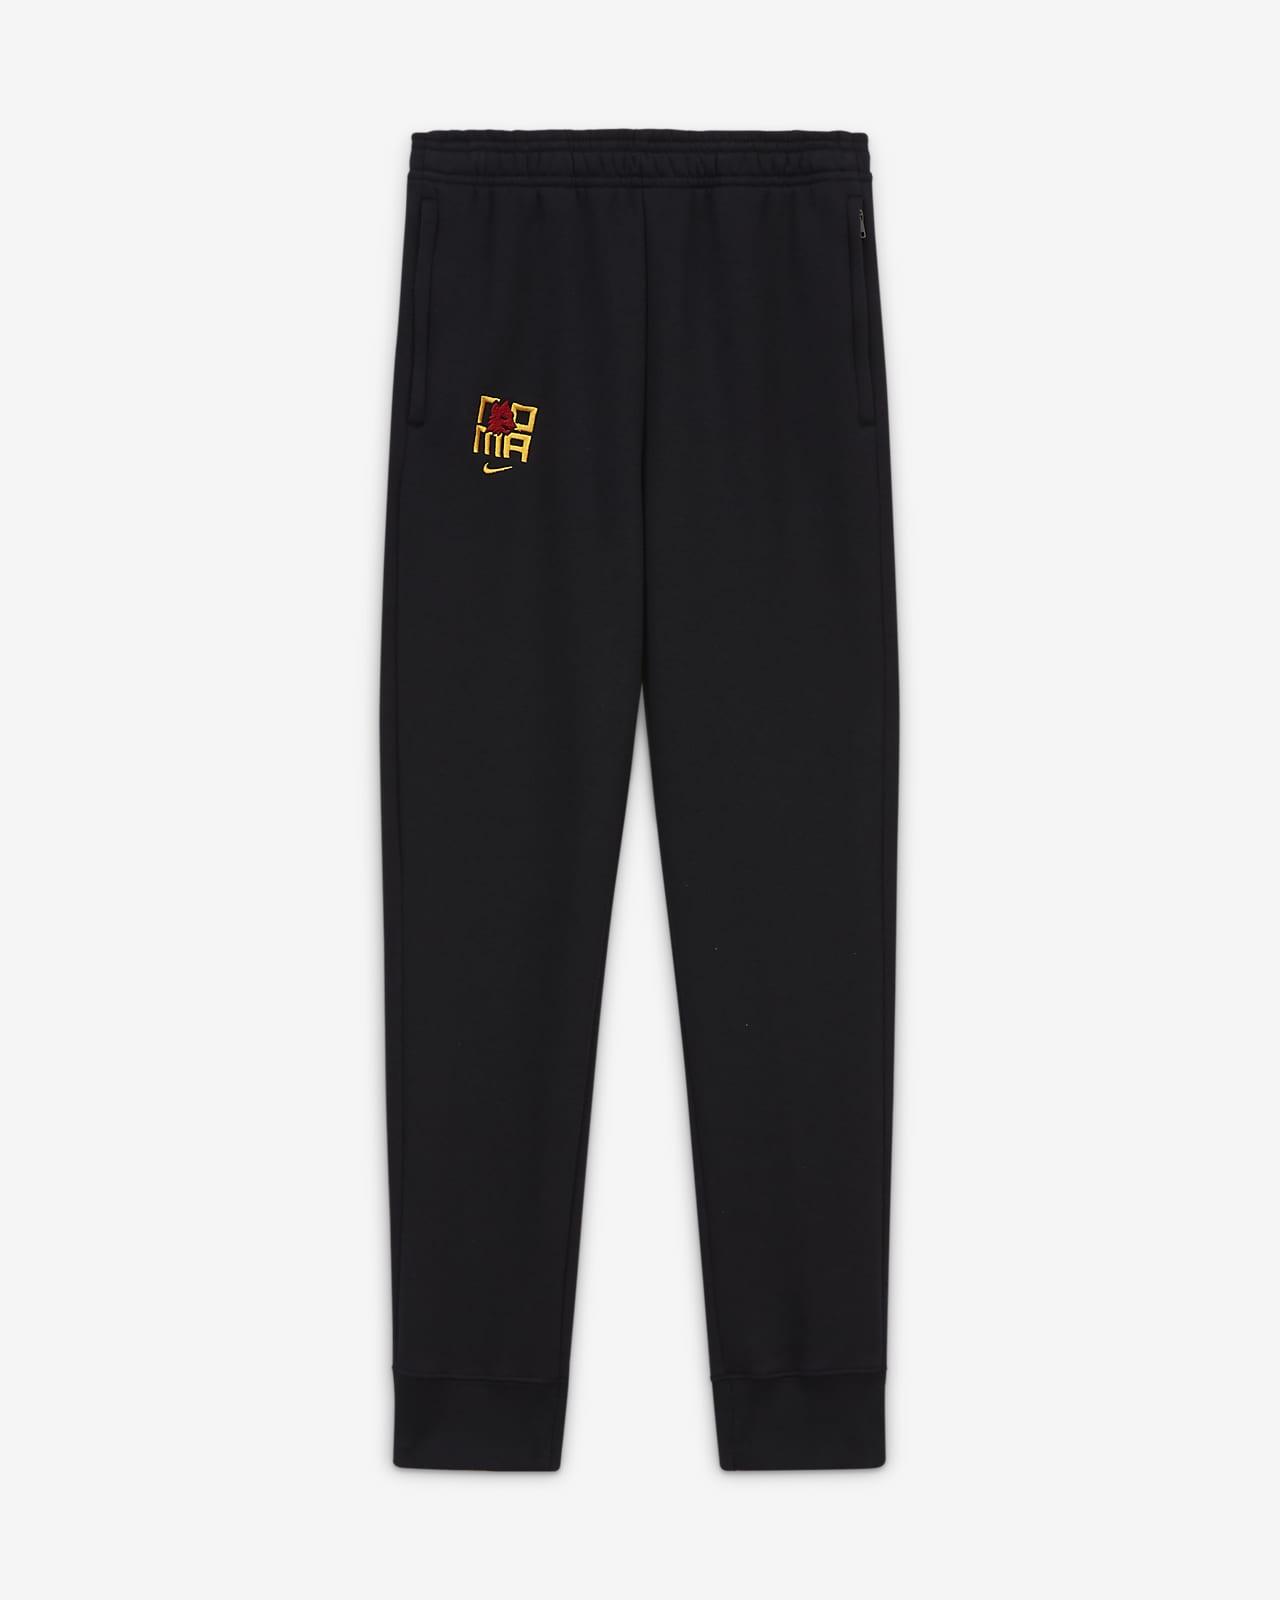 Pantaloni da calcio in fleece AS Roma - Ragazzi